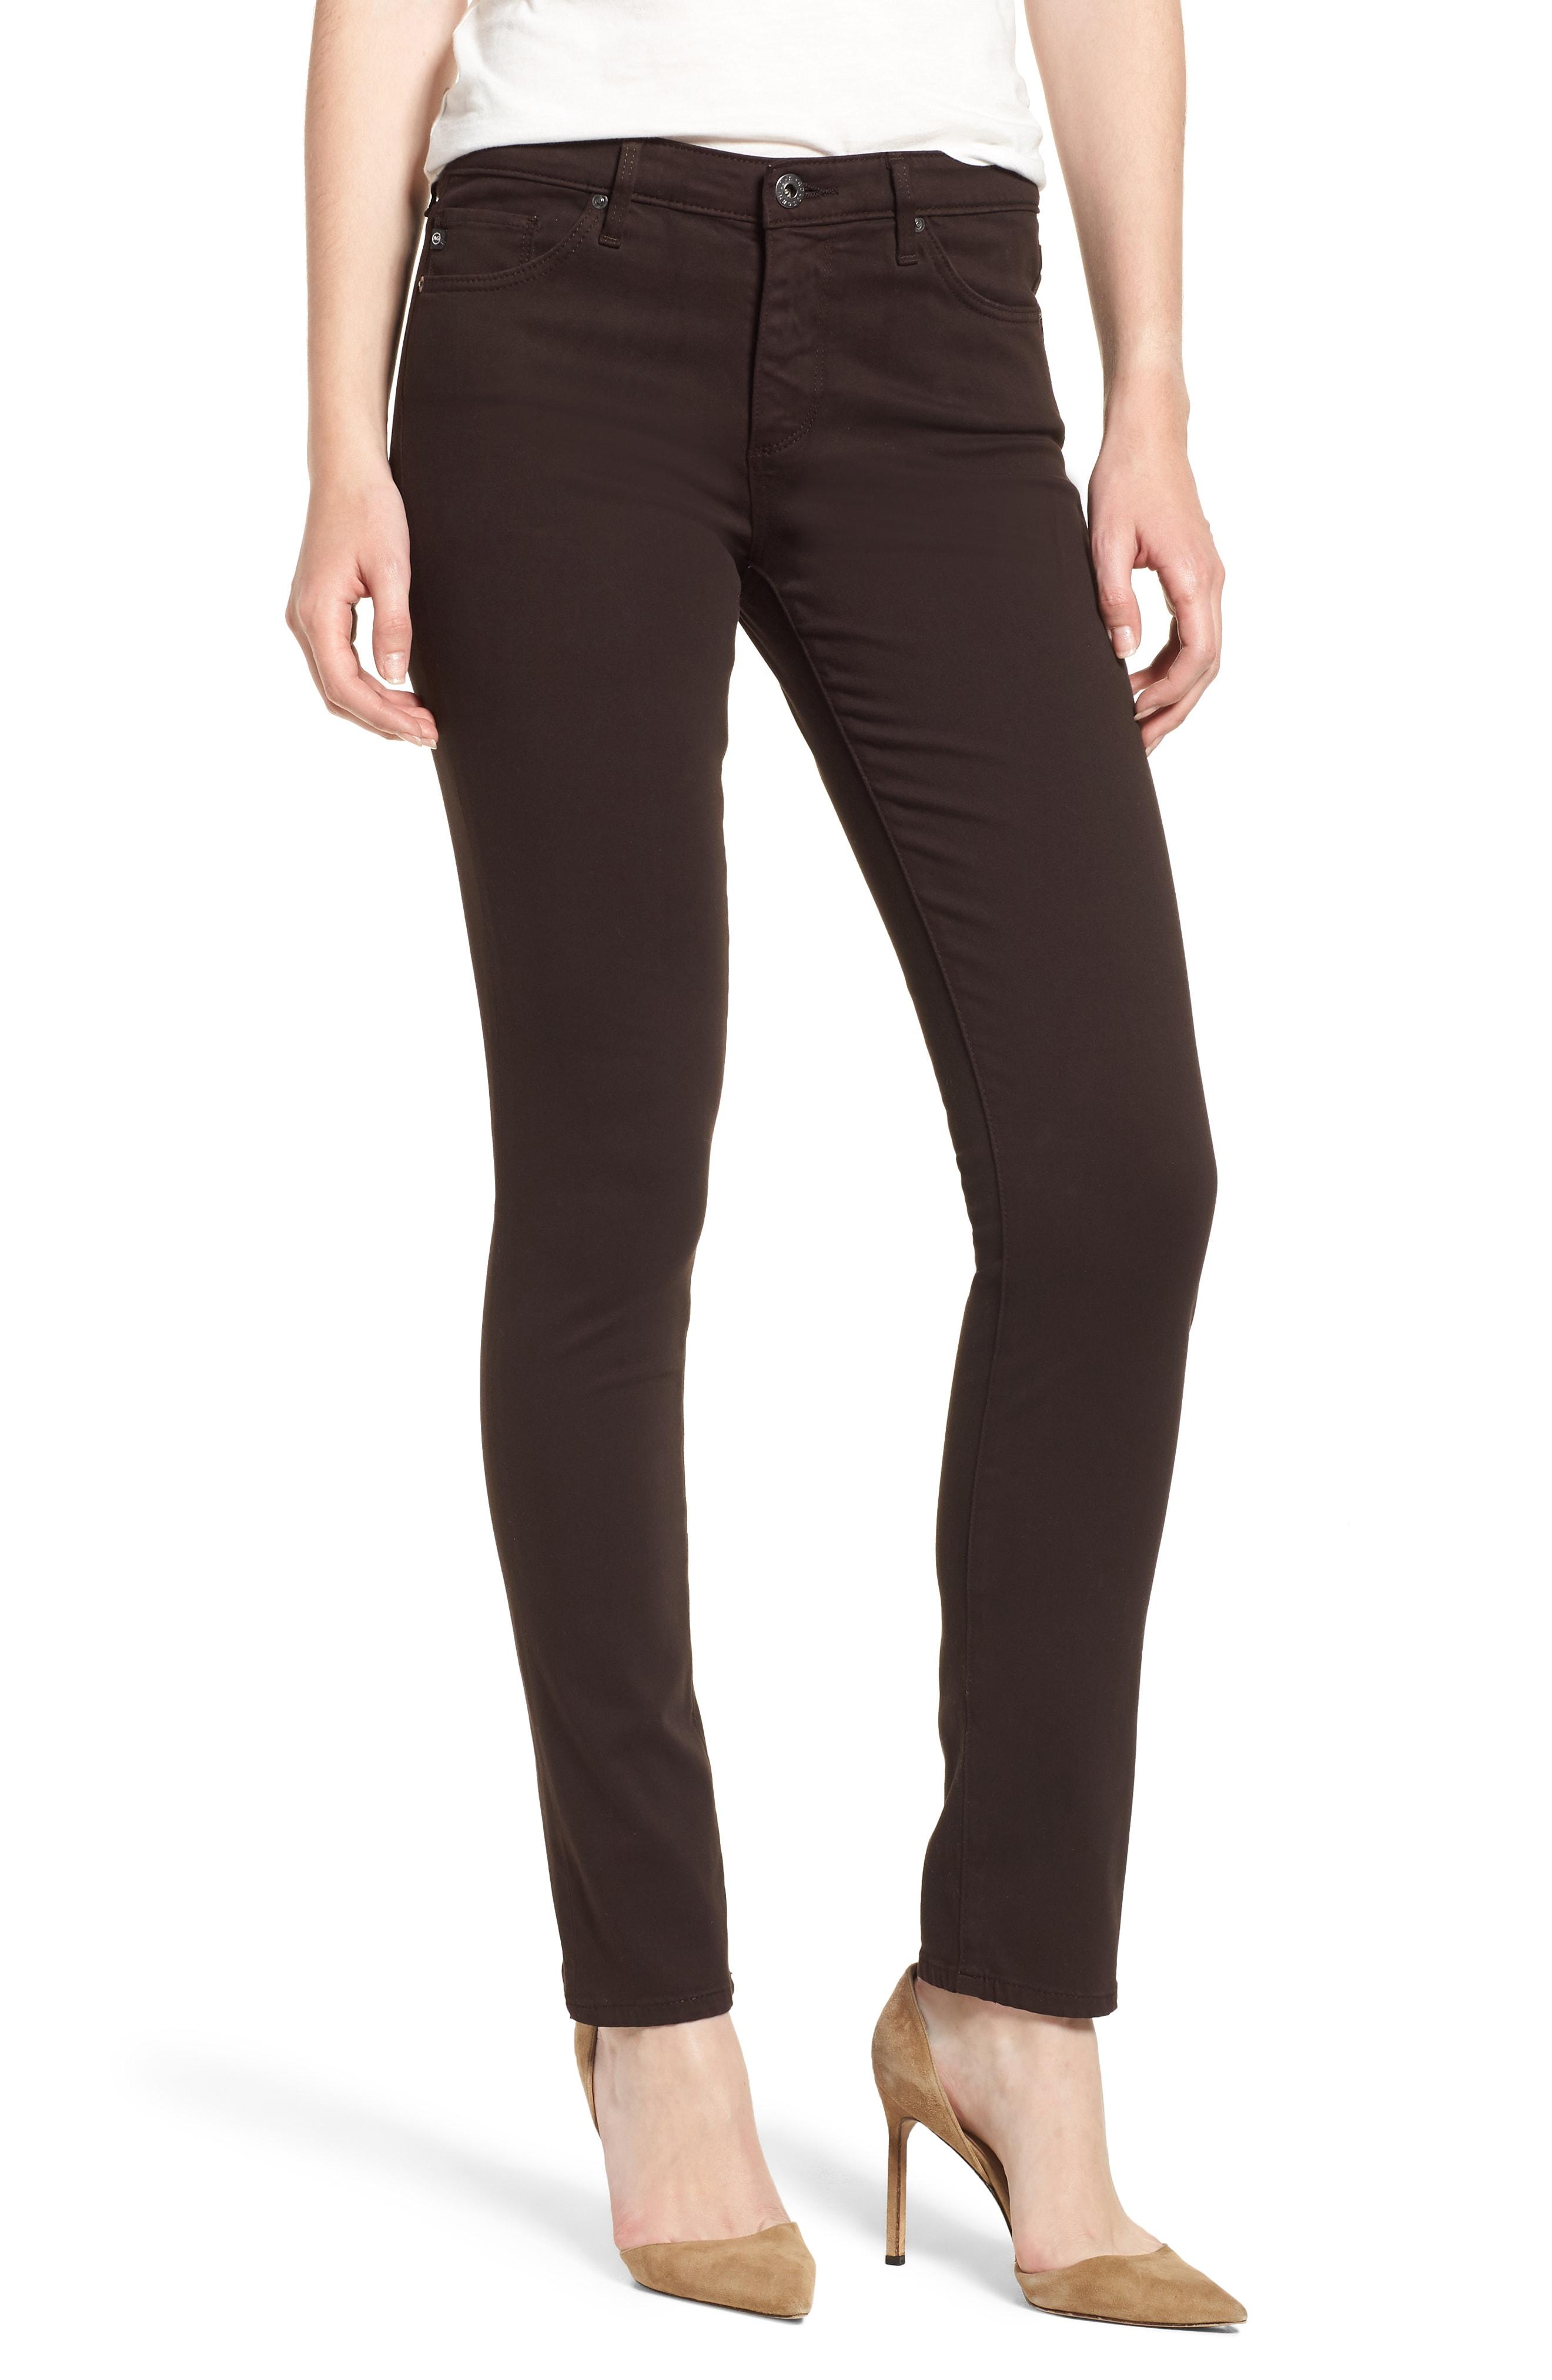 AG 'The Prima' Cigarette Leg Skinny Jeans